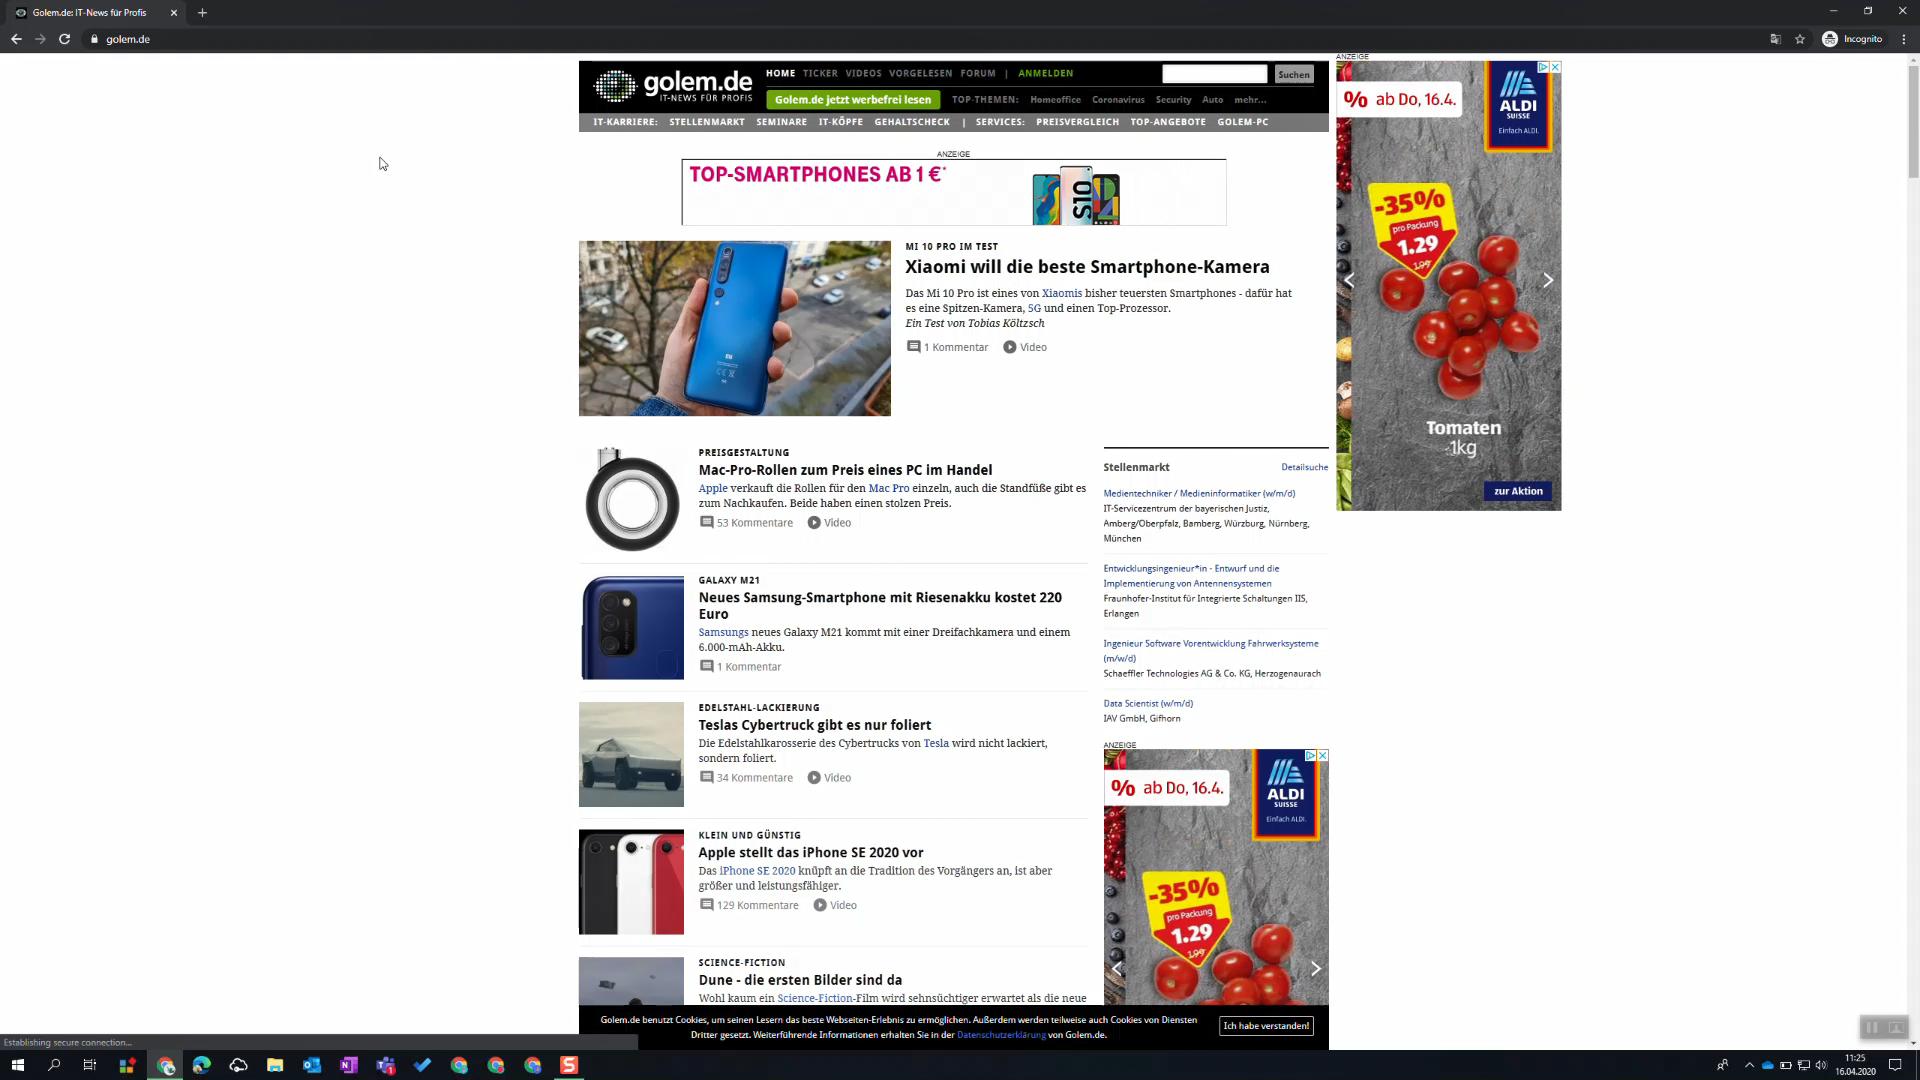 Golem.de mit Werbung